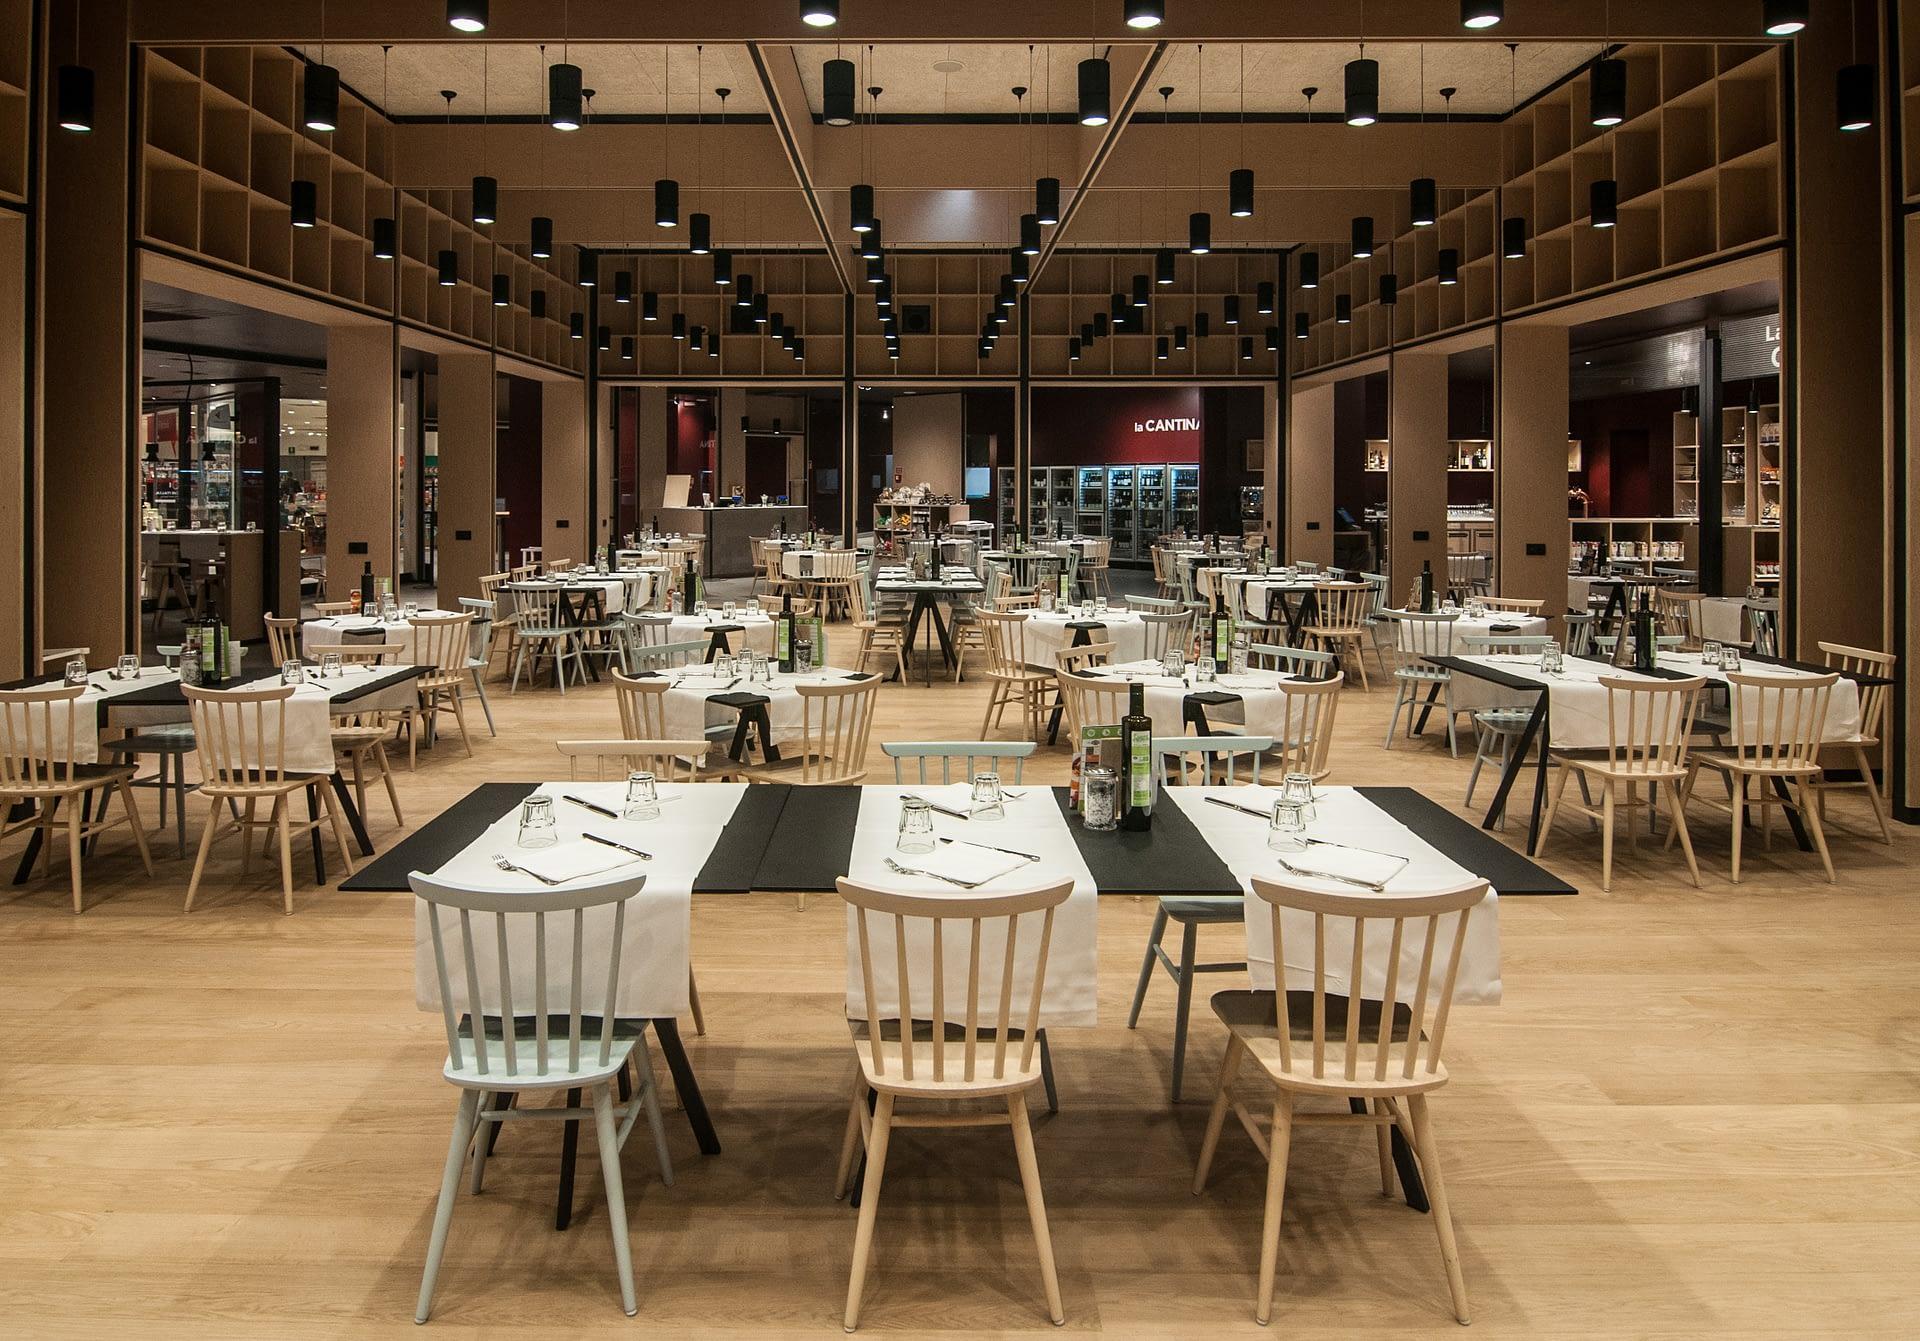 ristorante officine italia interni tavoli